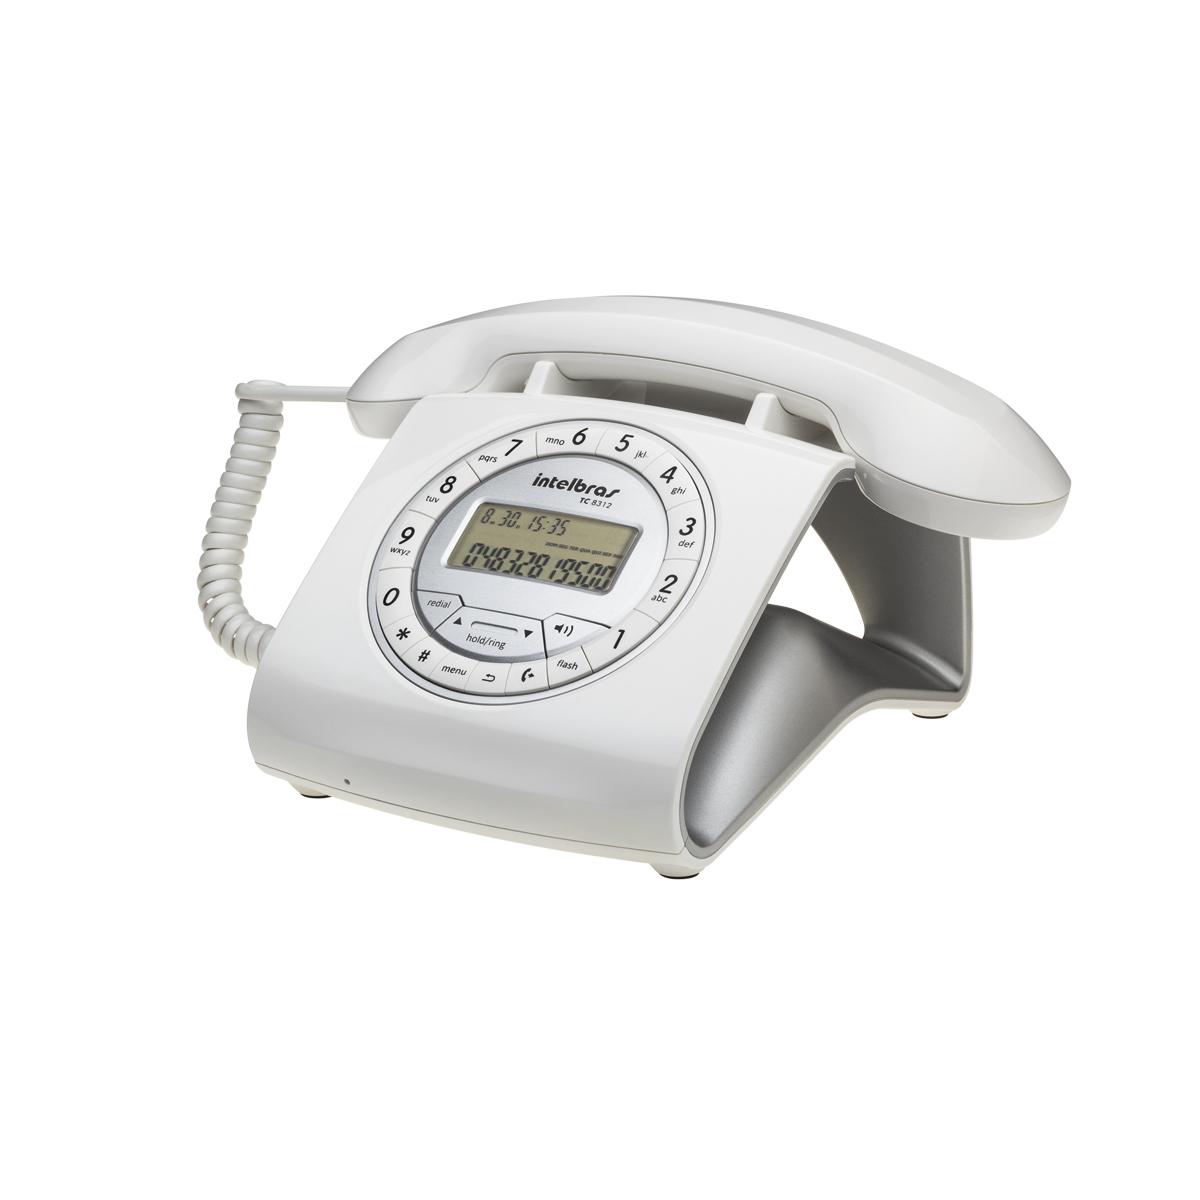 Telefone Com Fio e Estilo Retrô Cor Branco TC 8312 Intelbras